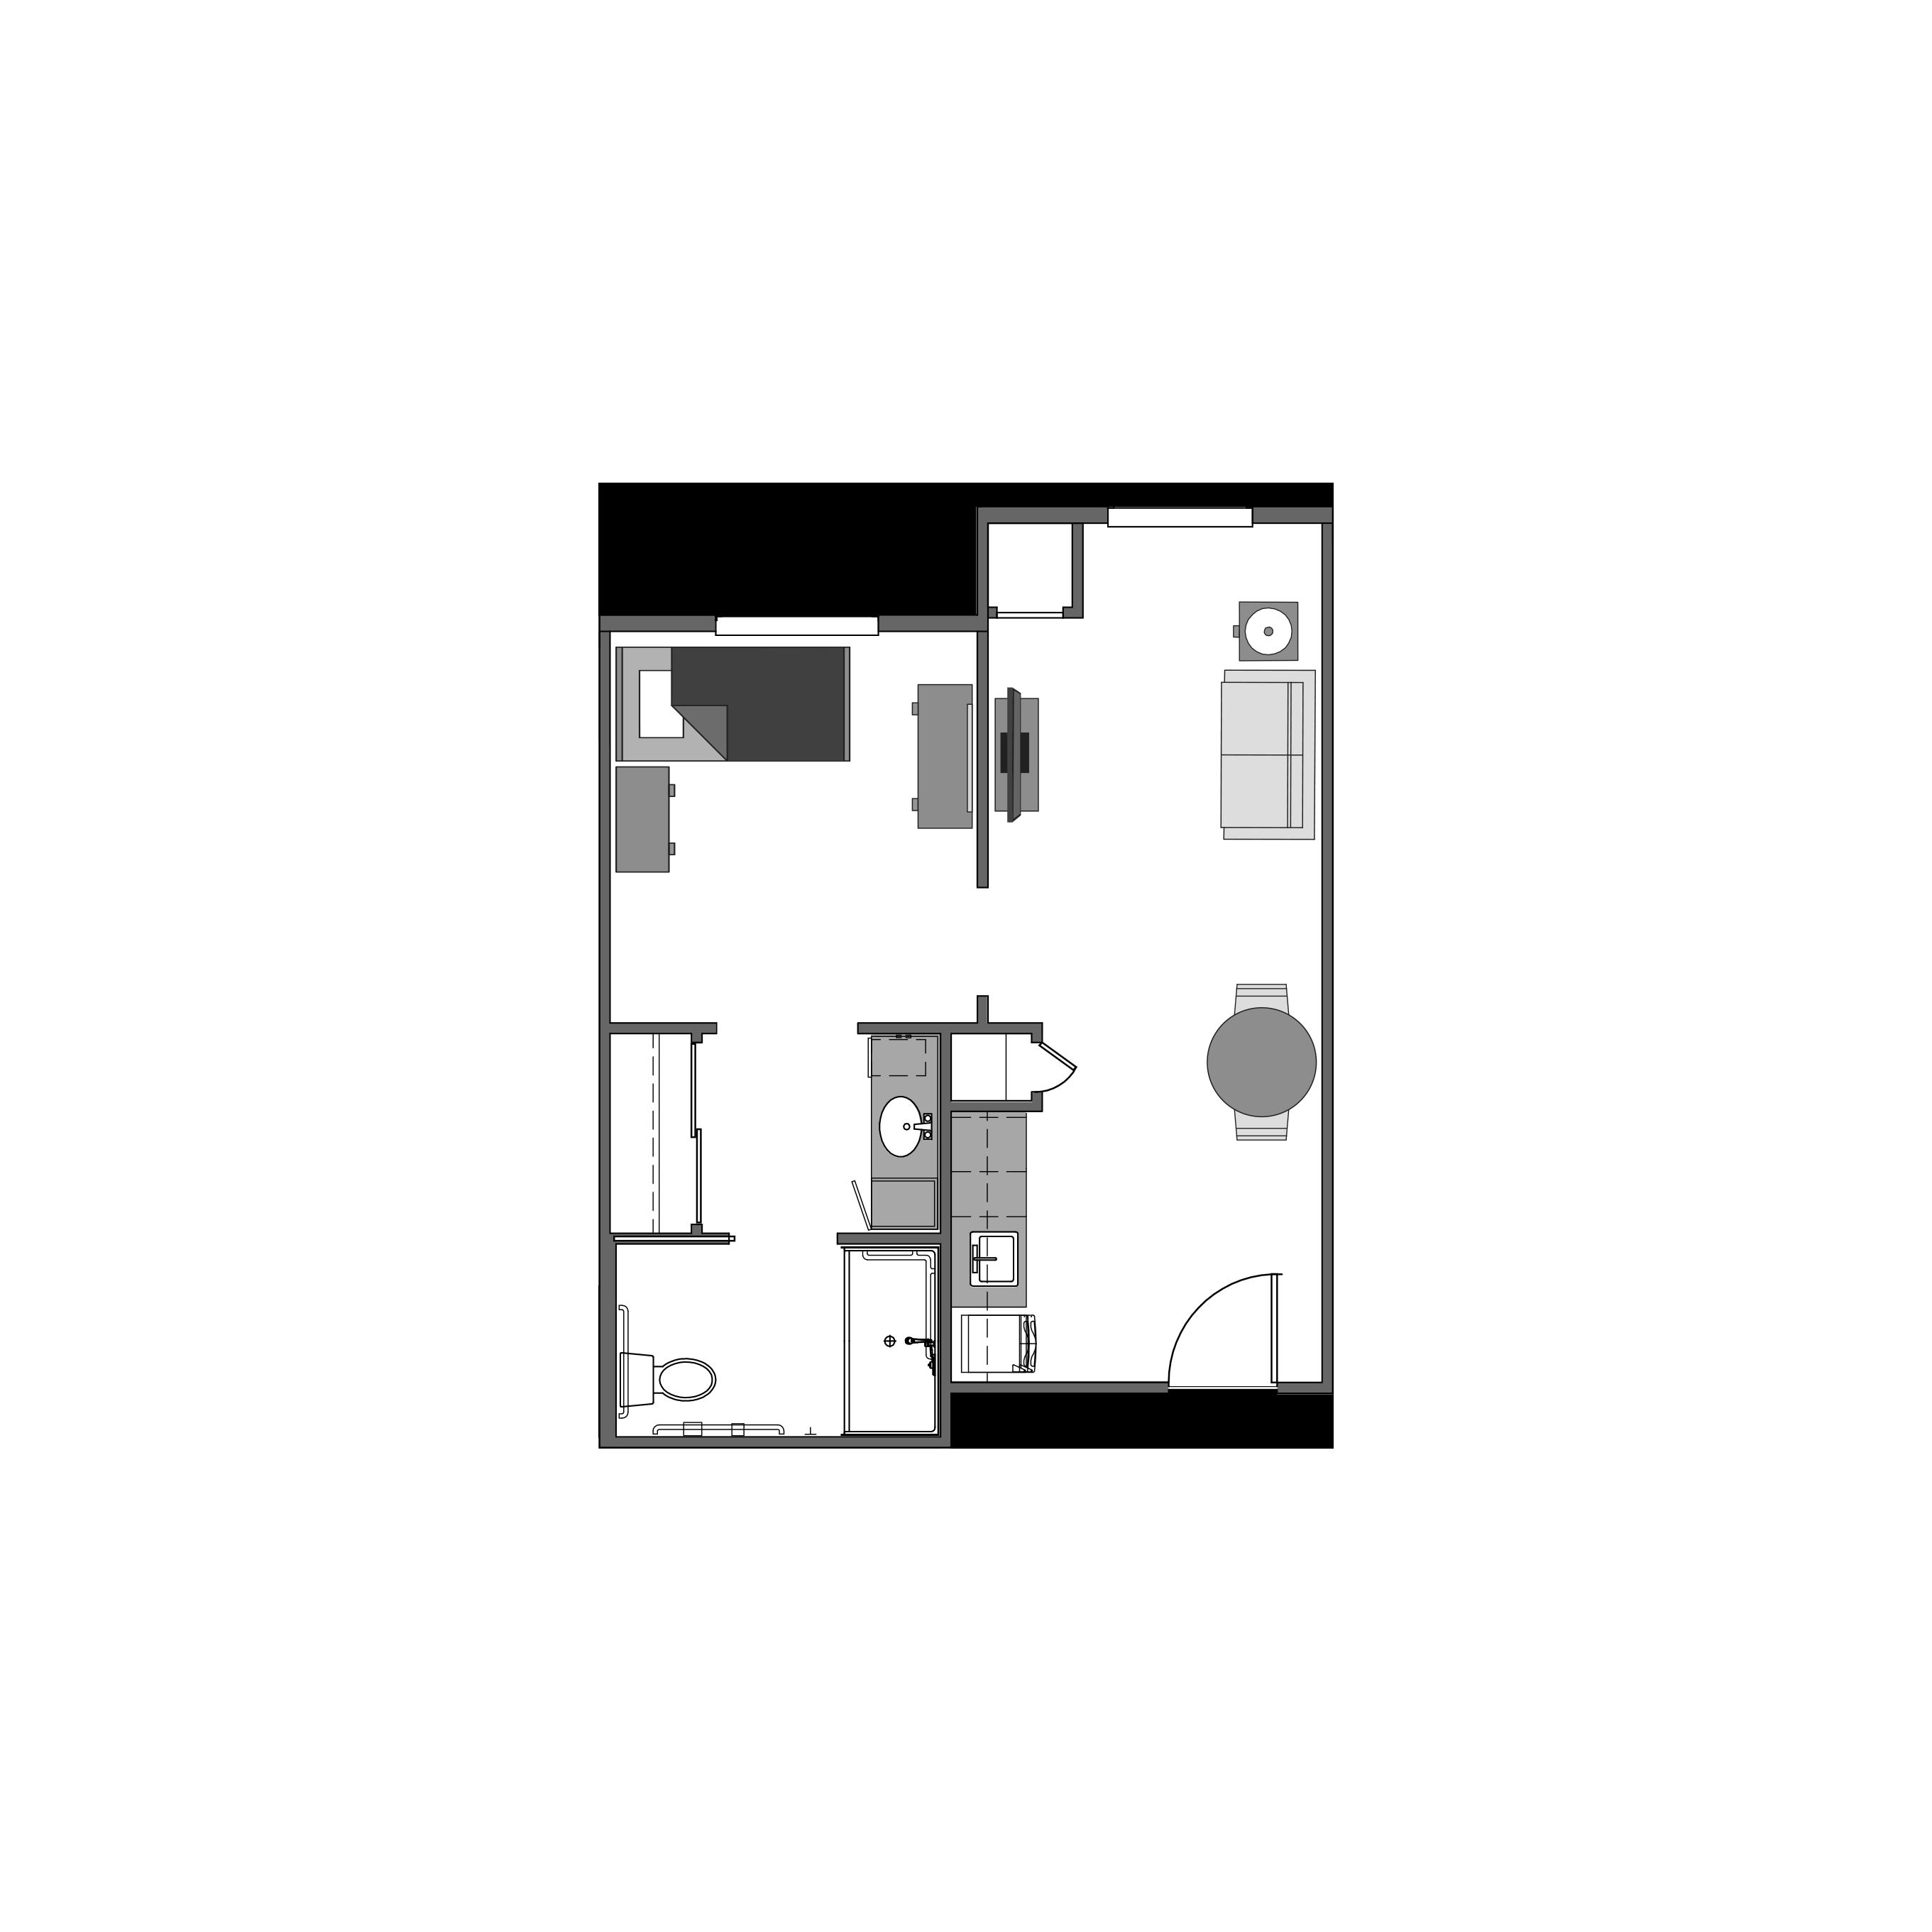 One bedroom floor plan, 470 square feet